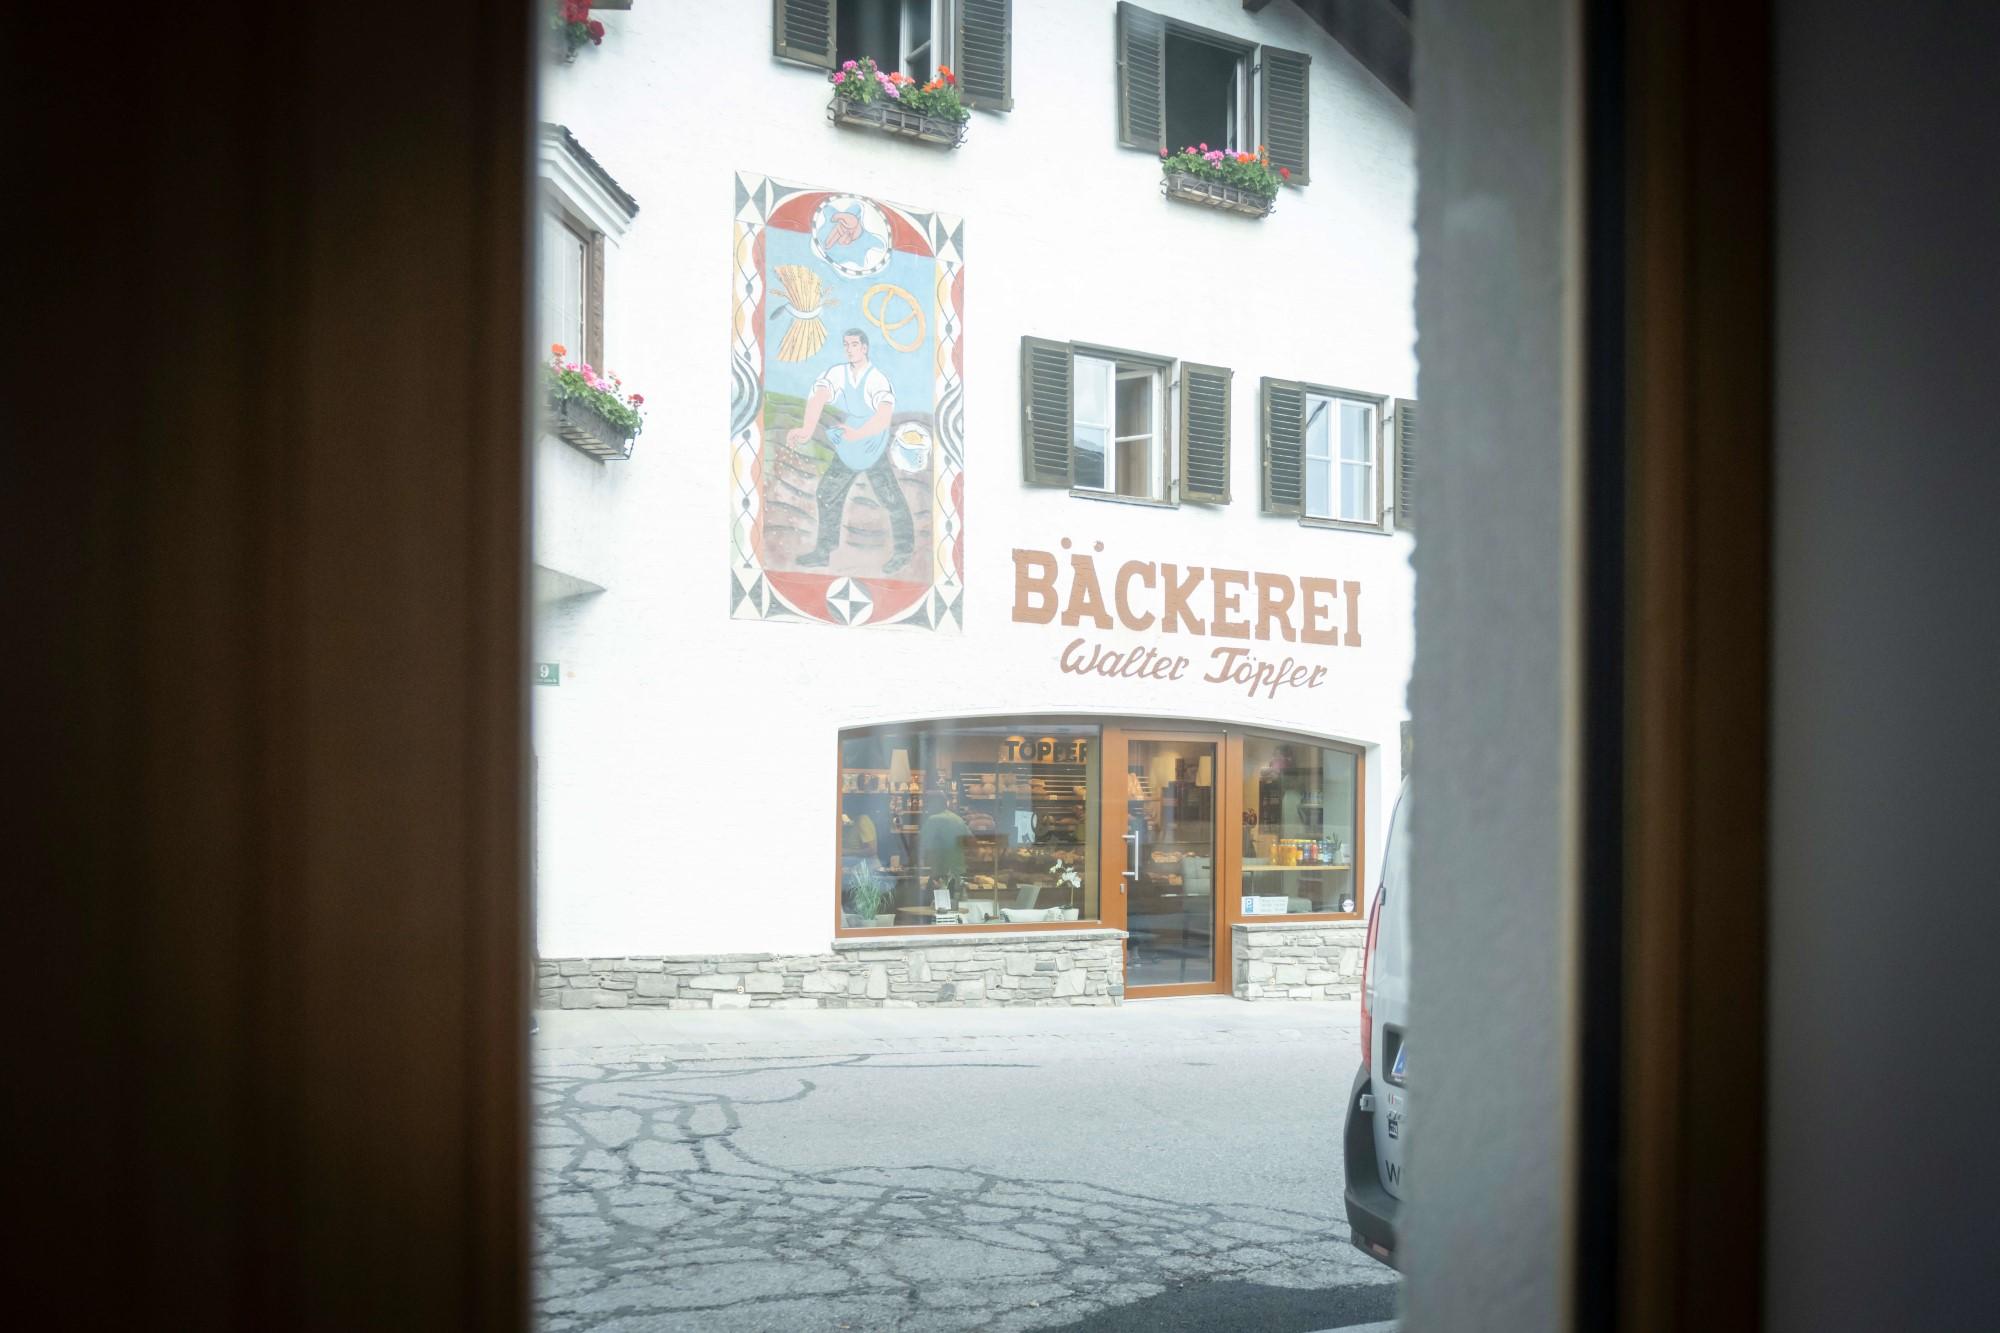 Blick aus dem Fenster hinüber zur Bäckerei Töpfer.